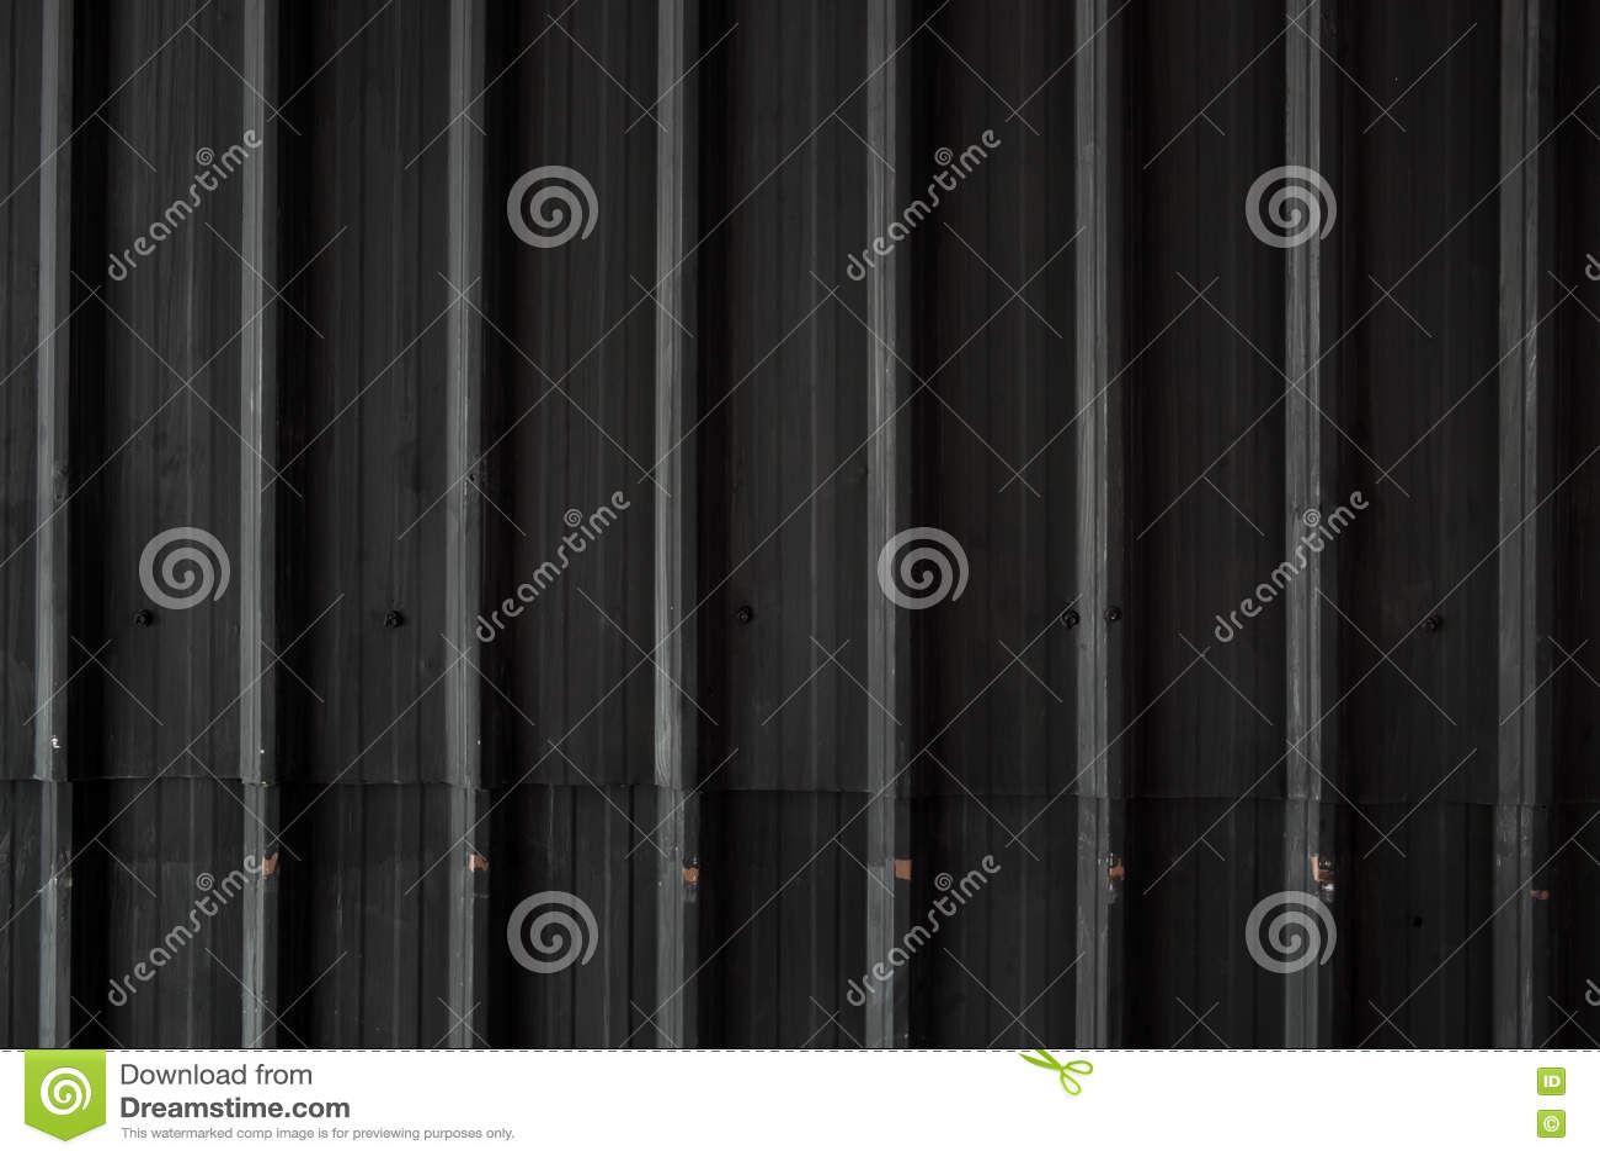 Old Black Metal Sheet Stock Image Image Of Background 77515855